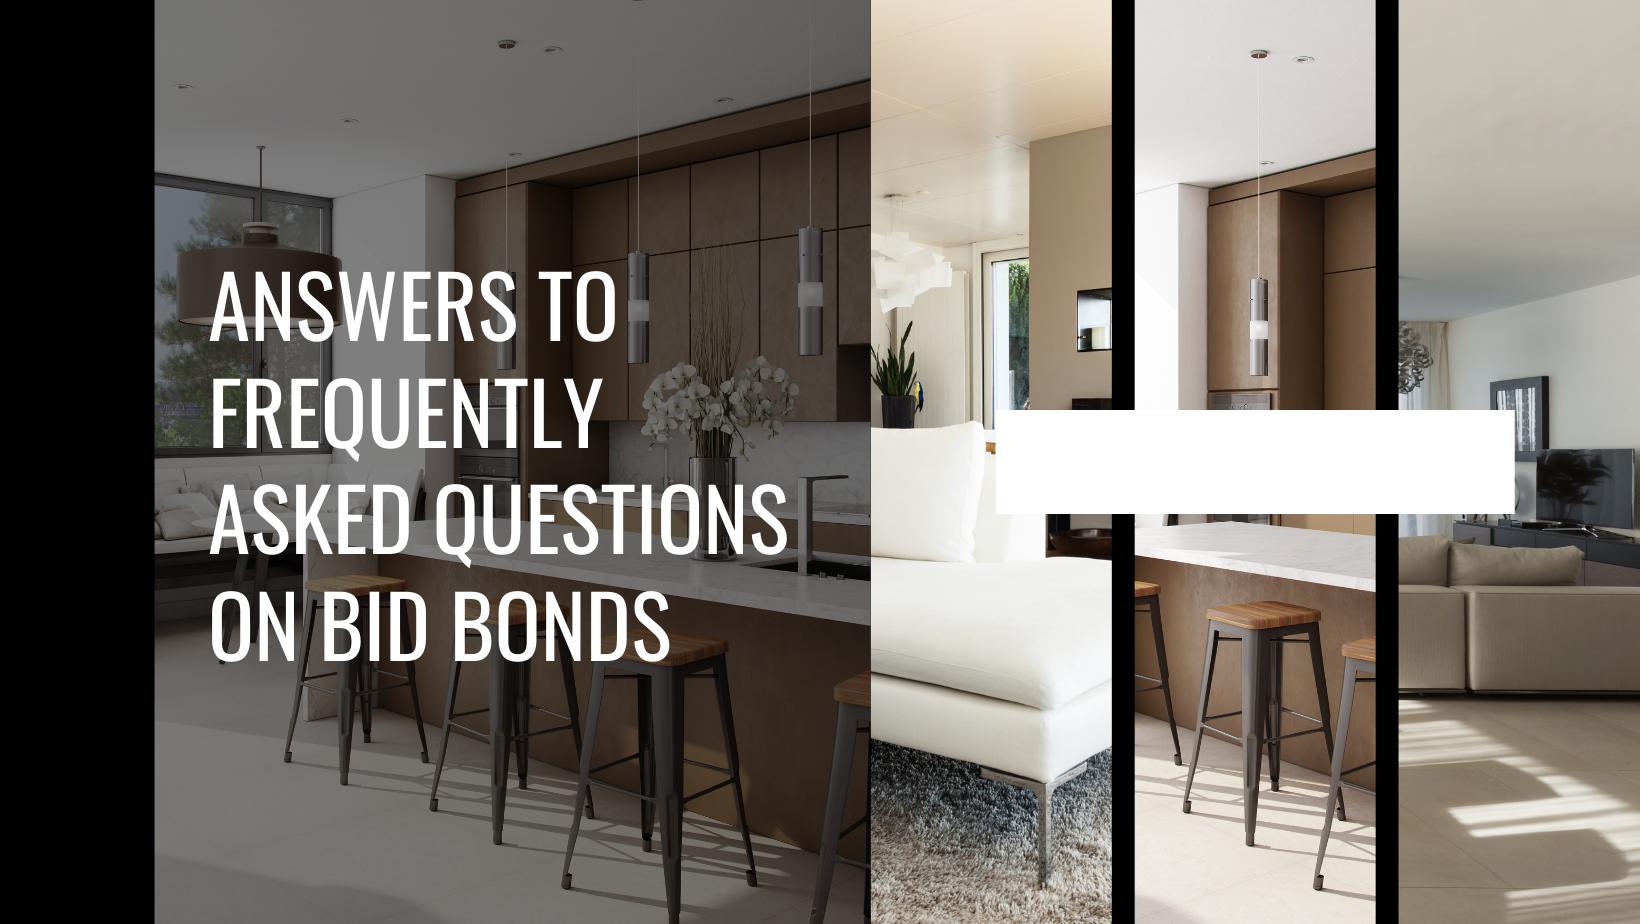 bid bonds - are bid bonds required - interior of a modern house